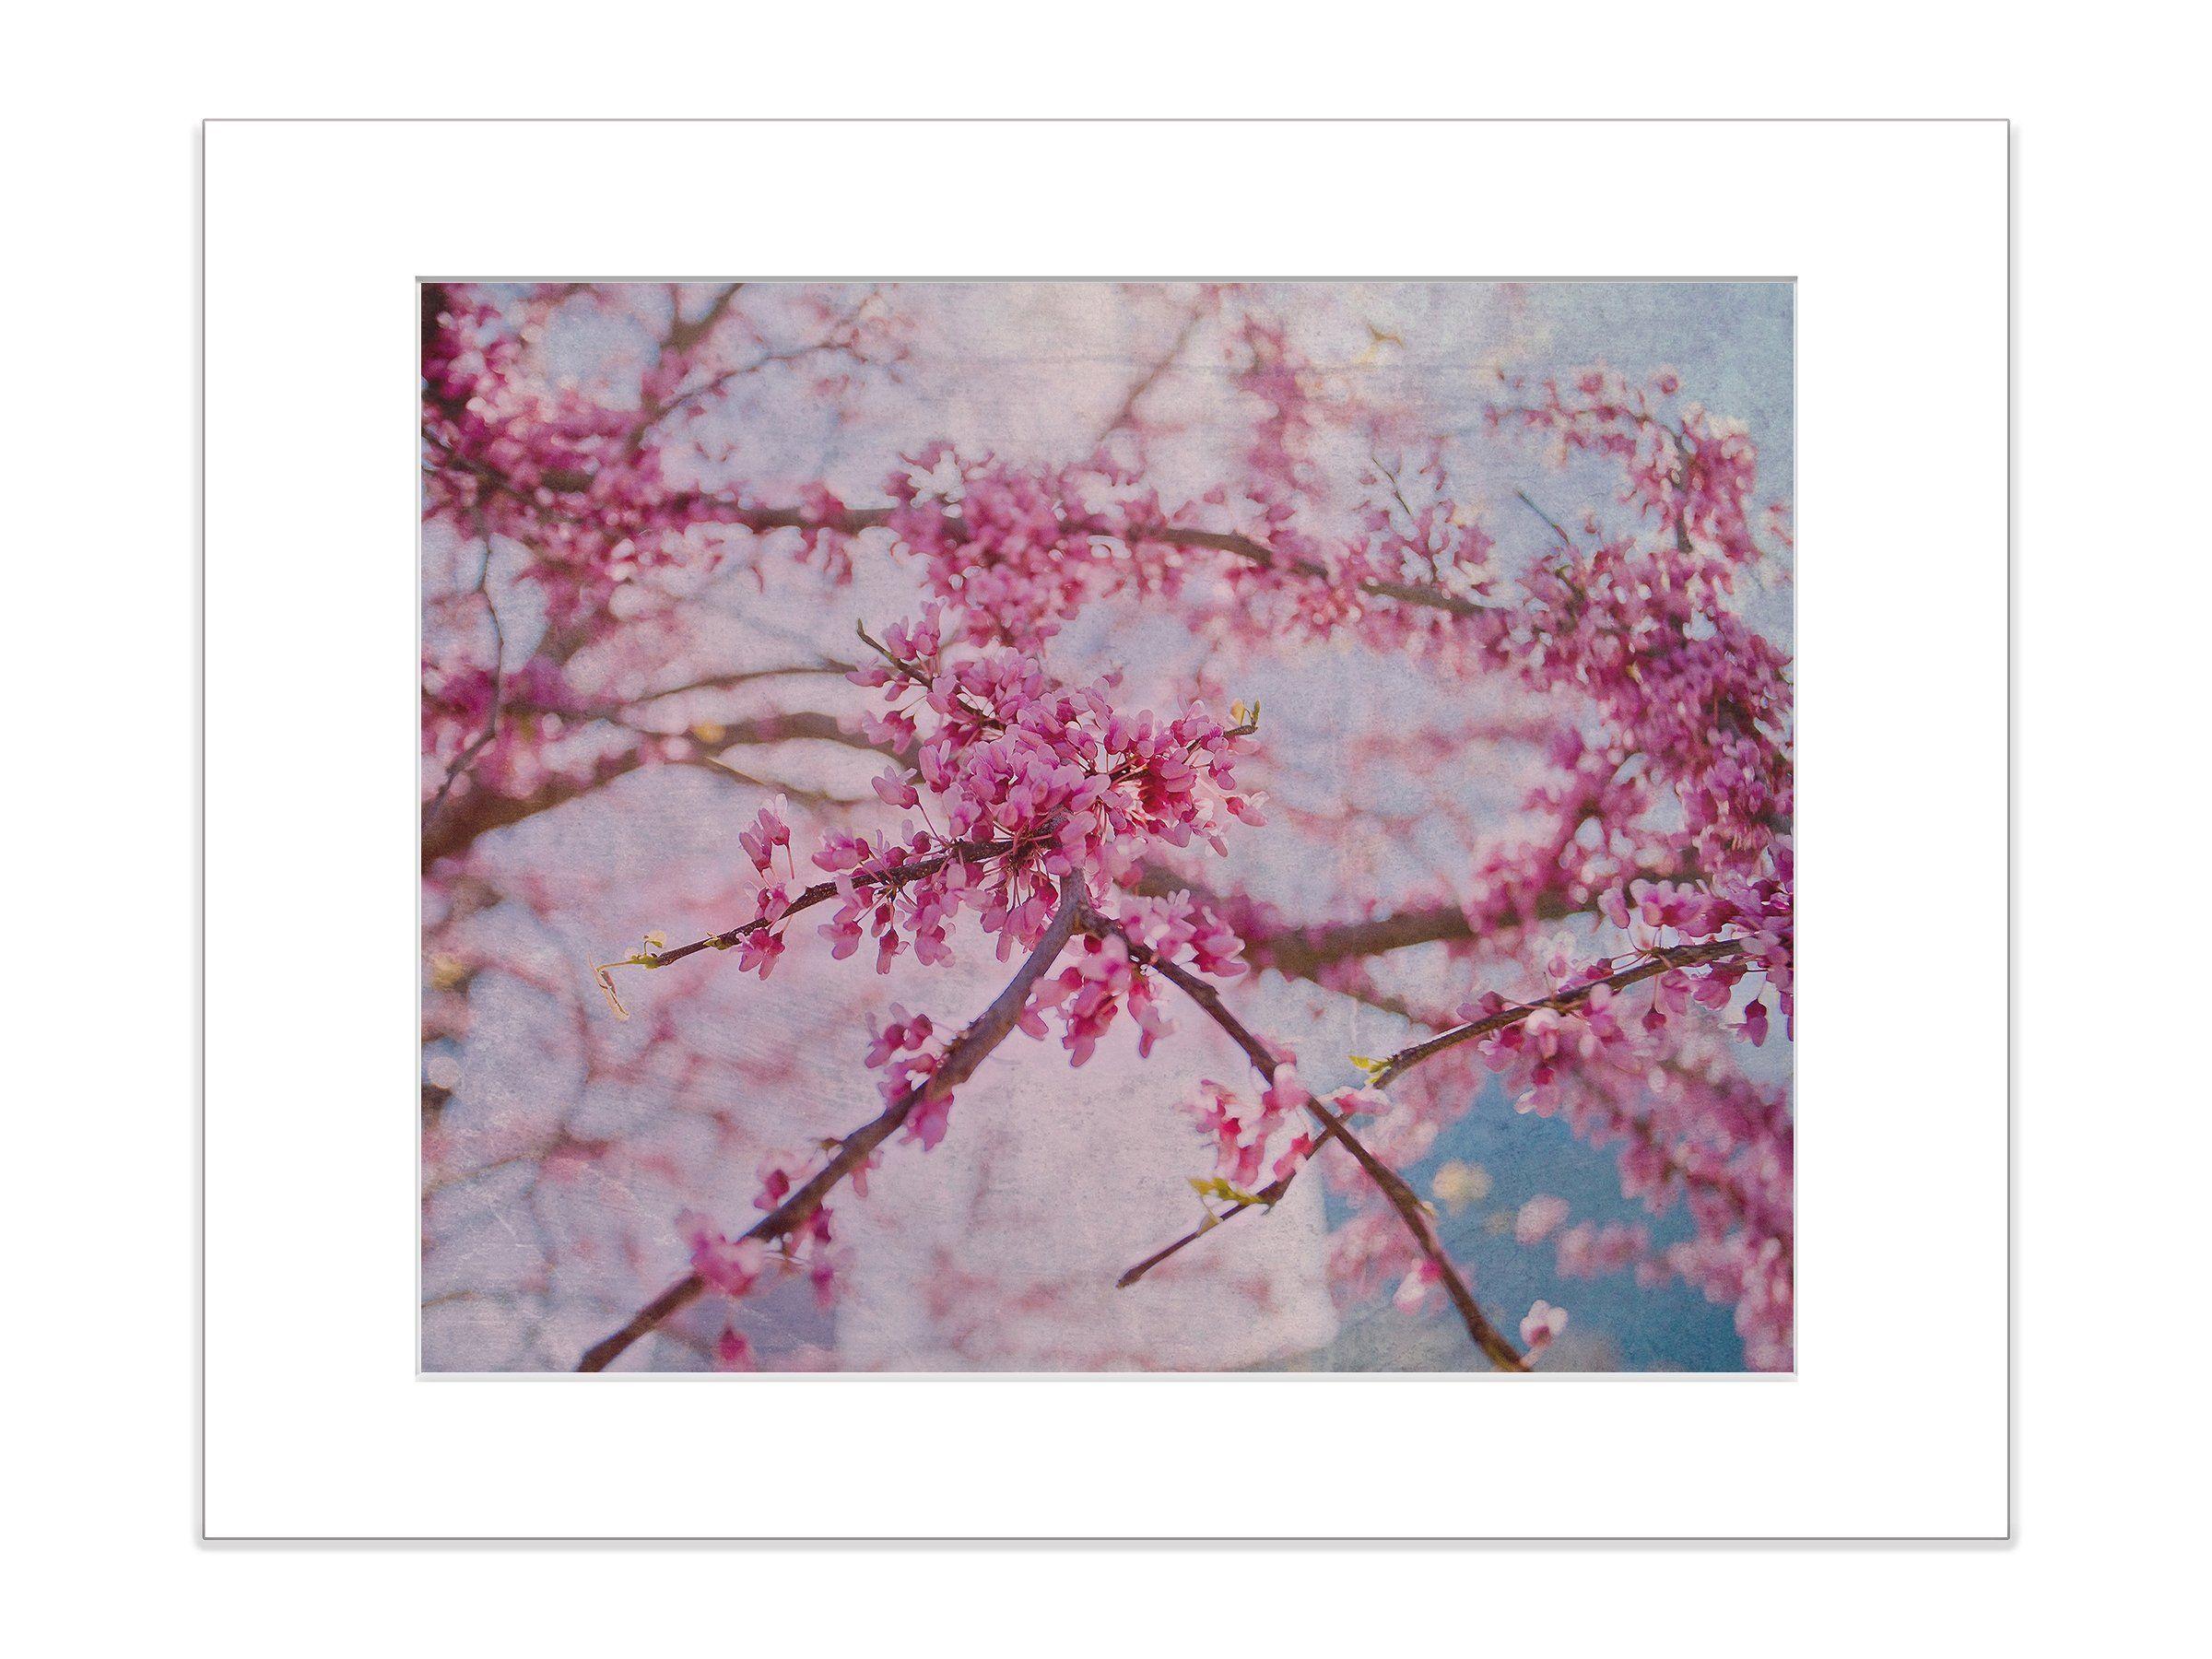 Cherry Blossom Pink Botanical Close Up Art Print Cherry Blossom Art Pink Wall Art Cherry Blossom Images